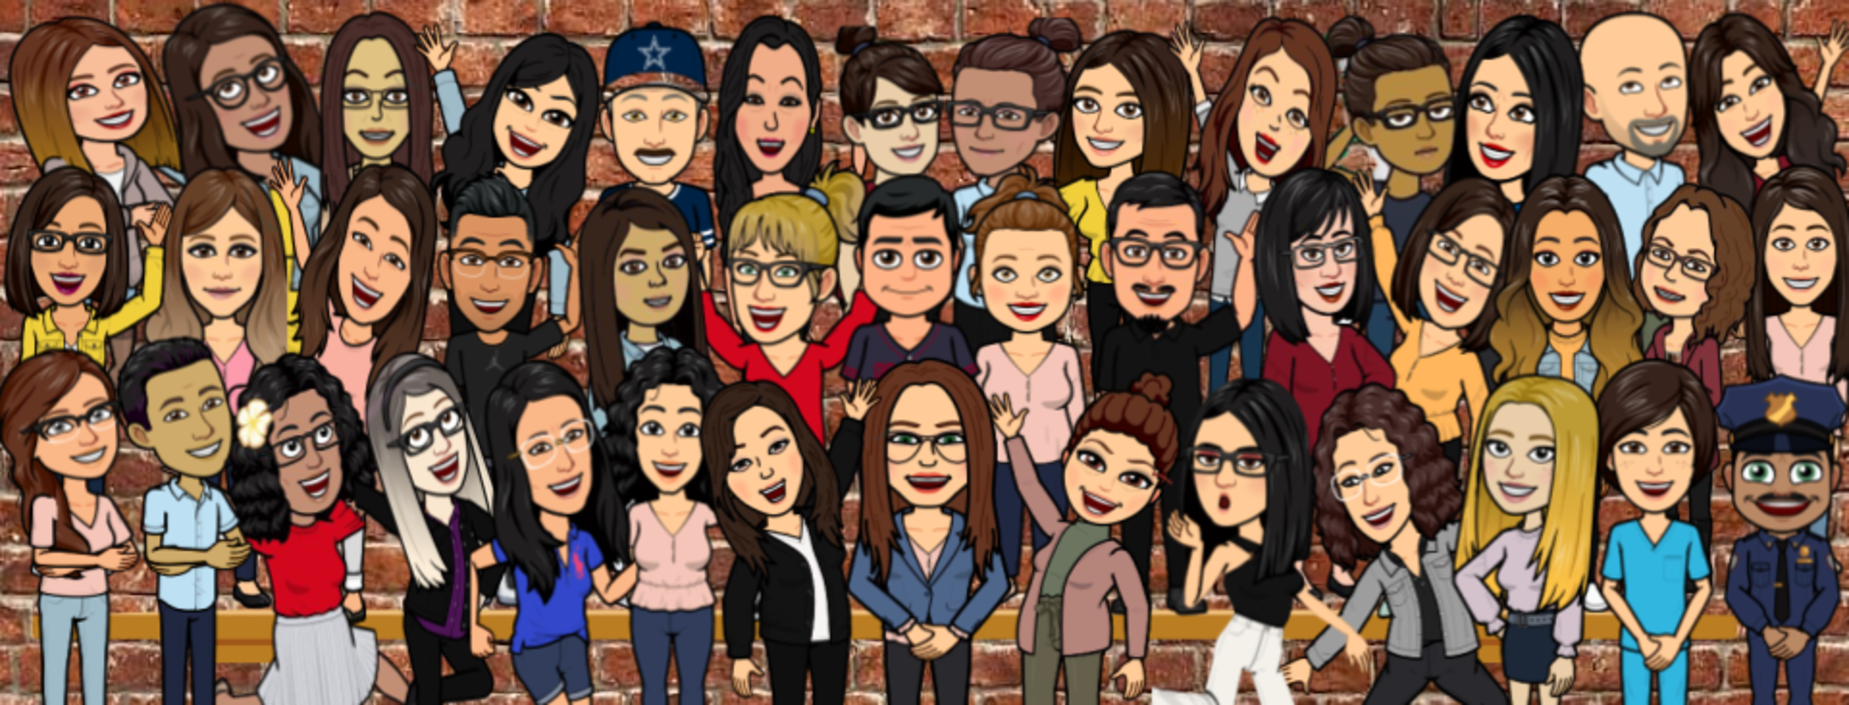 Austin Staff Members in Bitmoji Format